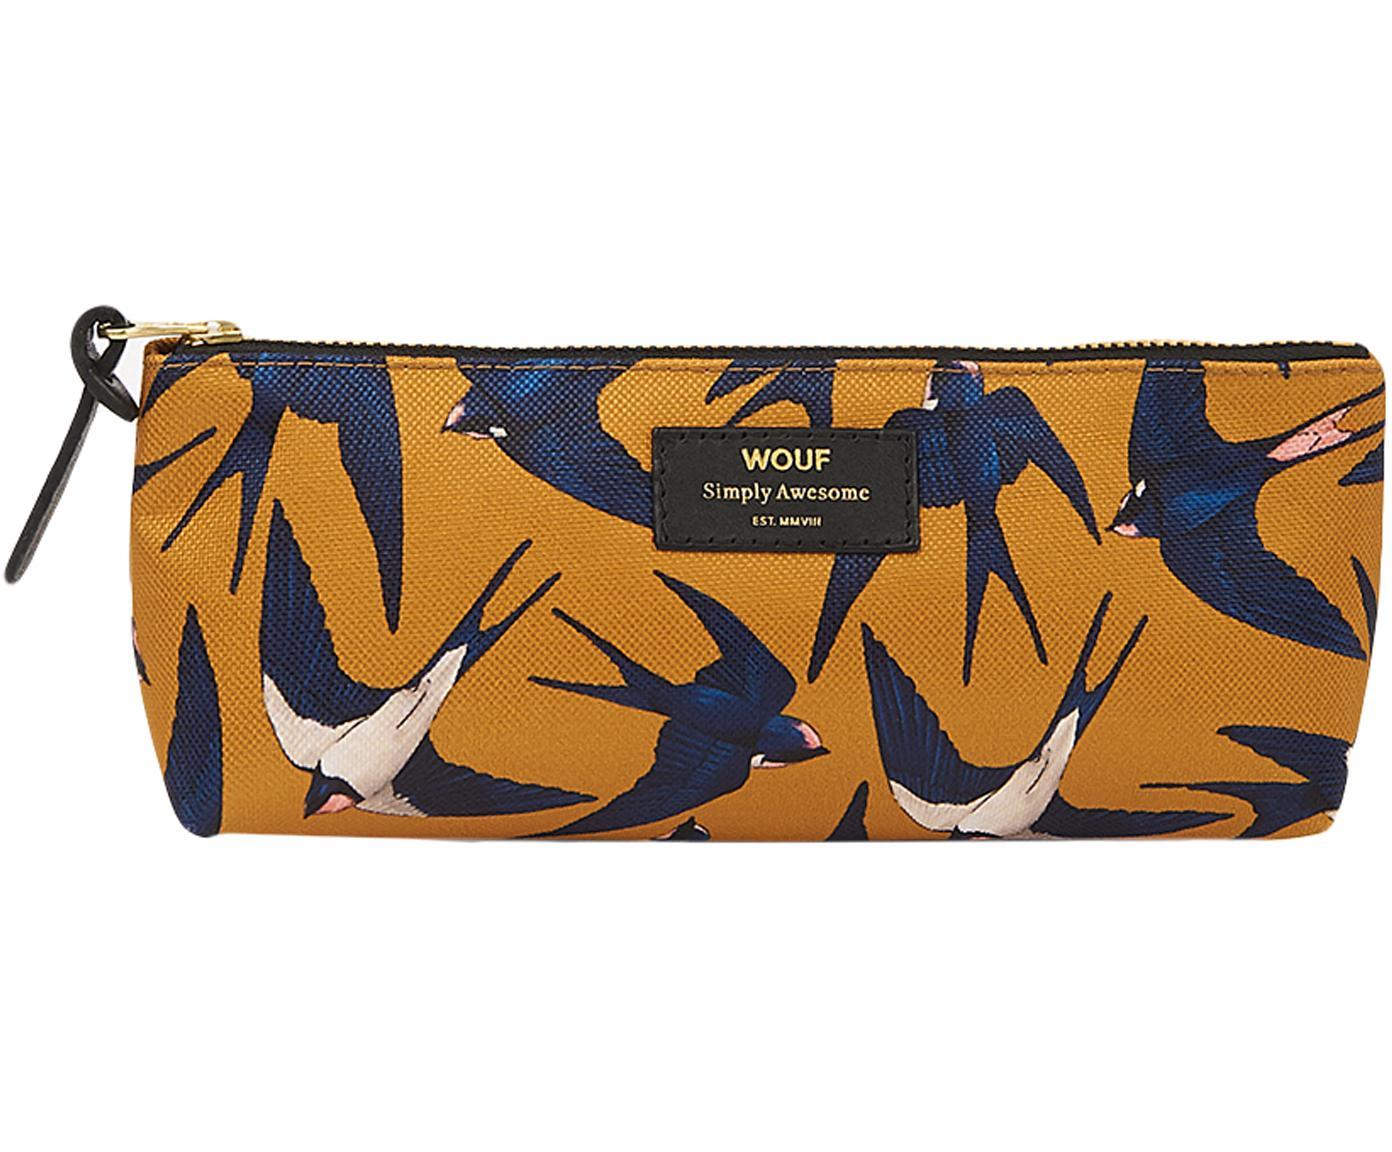 Pennenetui Swallow, Polyester, leer, Geel, blauw, beige, 22 x 9 cm